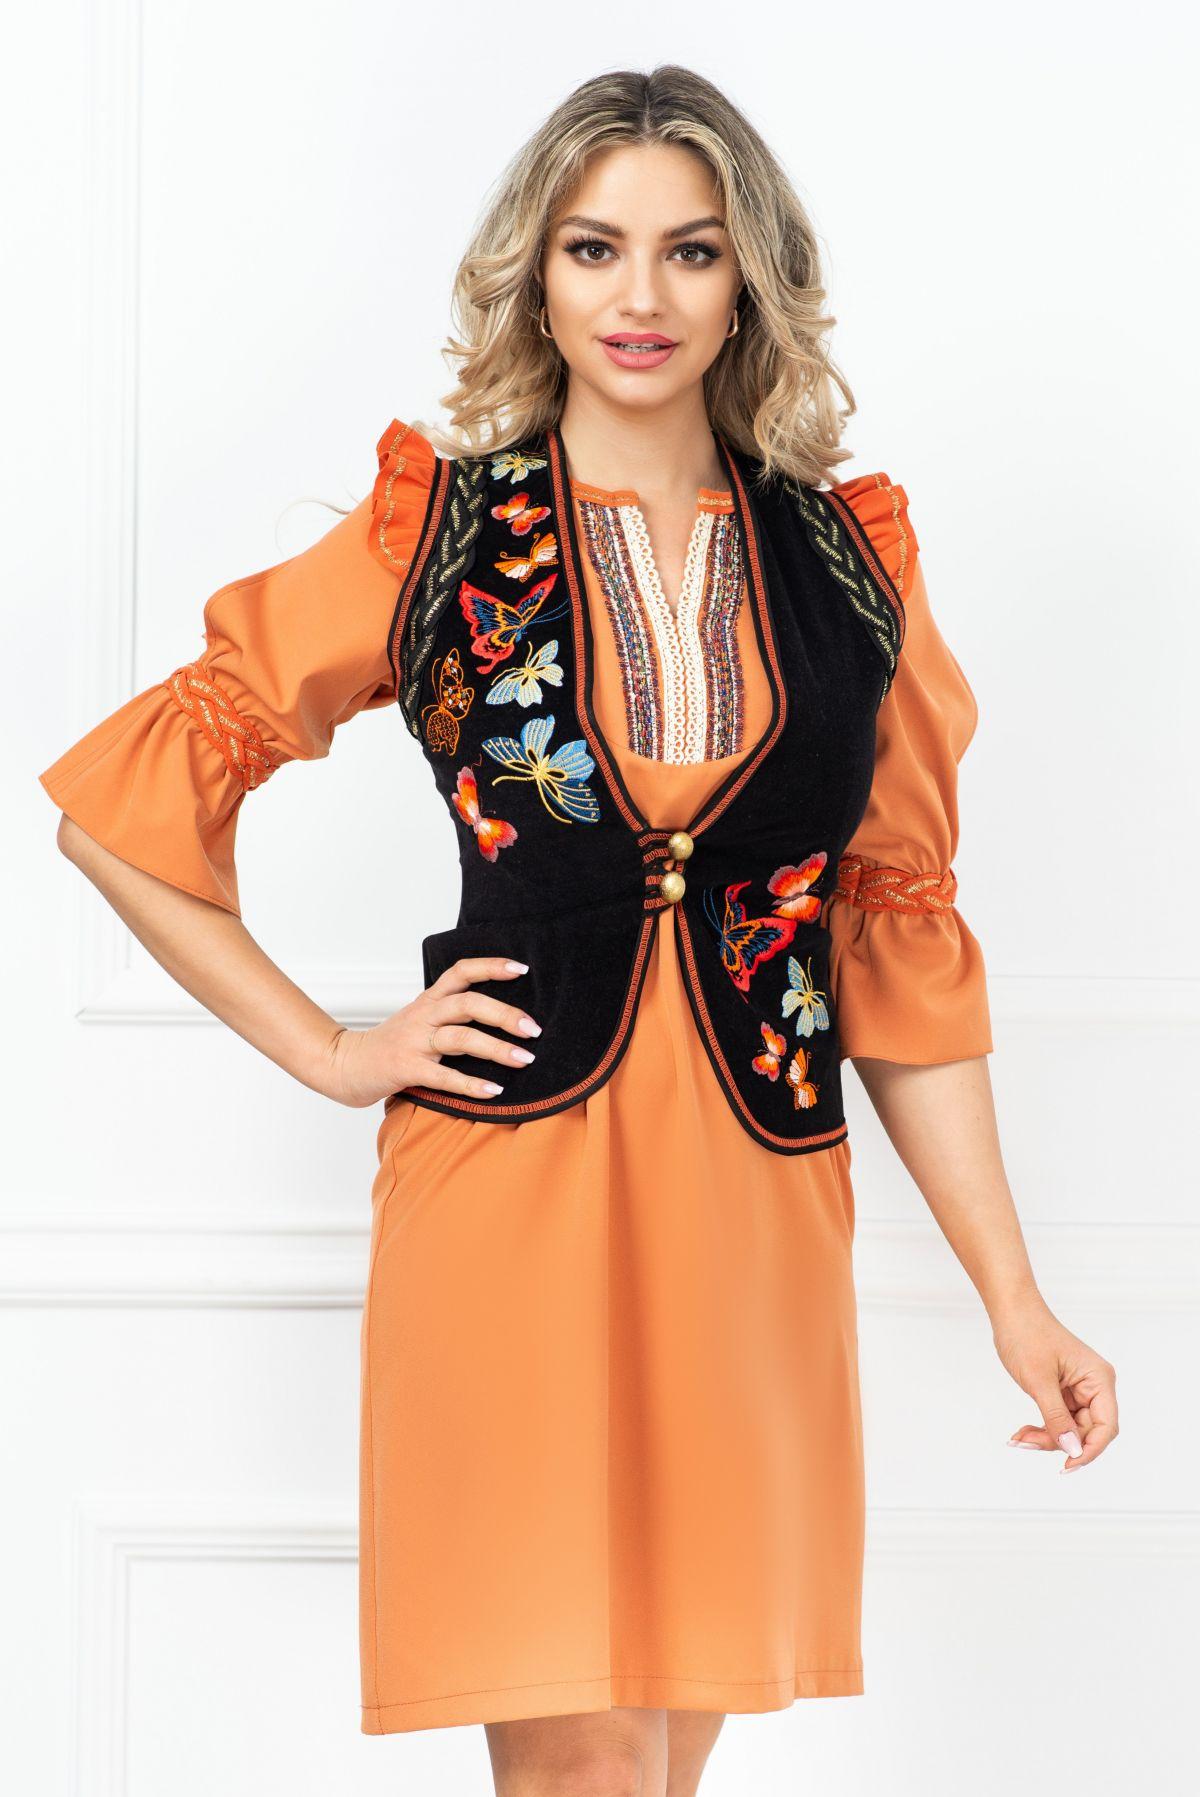 Vesta Venezia traditionala cu fluturi orange brodati si volane la umeri